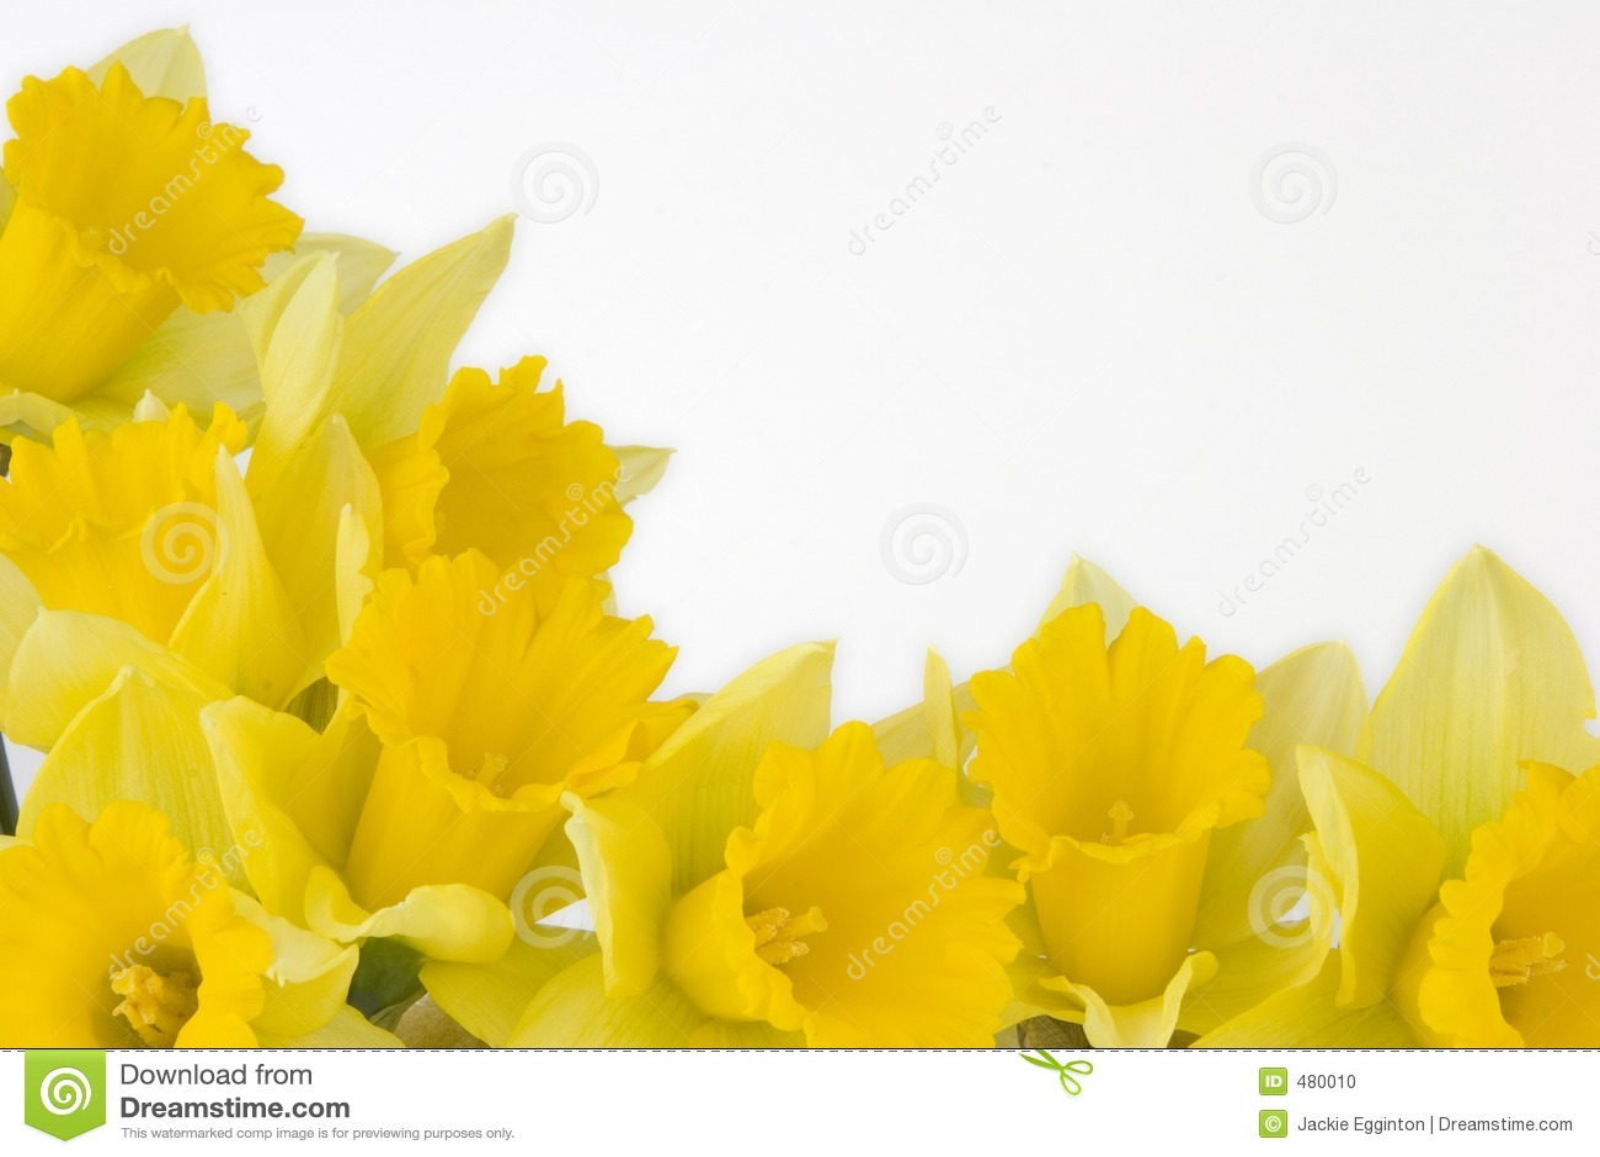 Daffodil Border Stock Photo - Image: 480010